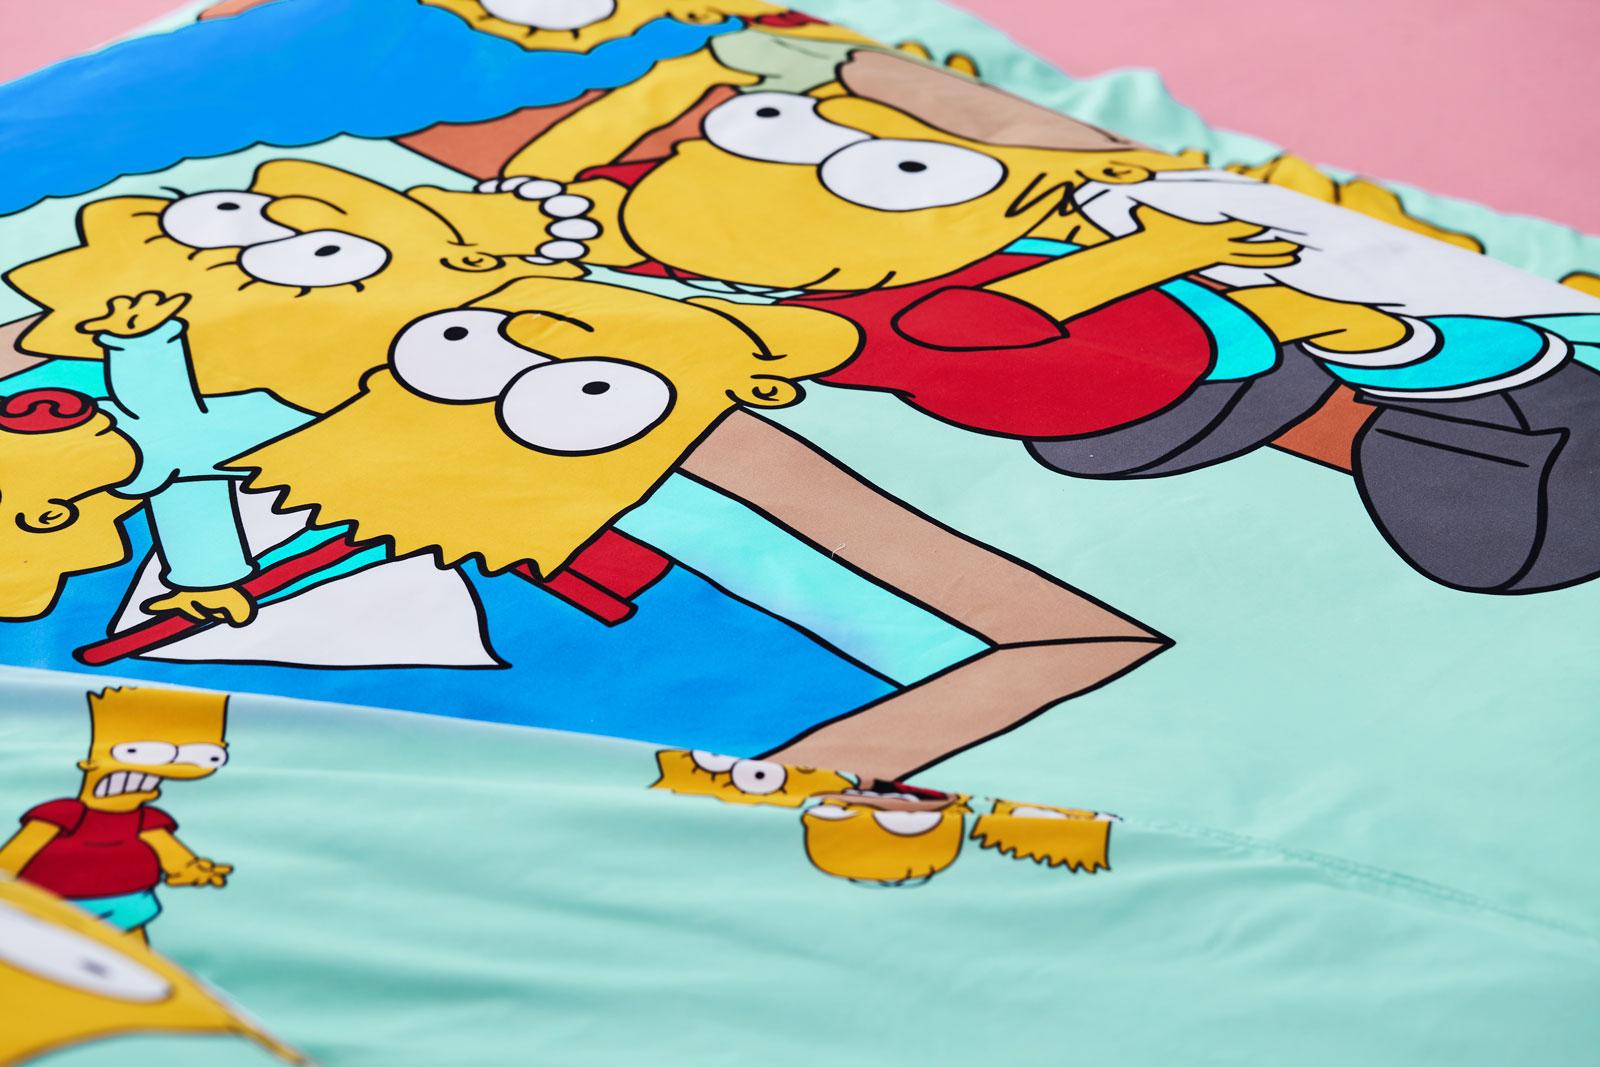 Lotus รุ่น Pop-art The Simpsons ชุดผ้าปูที่นอน LI-SS-04